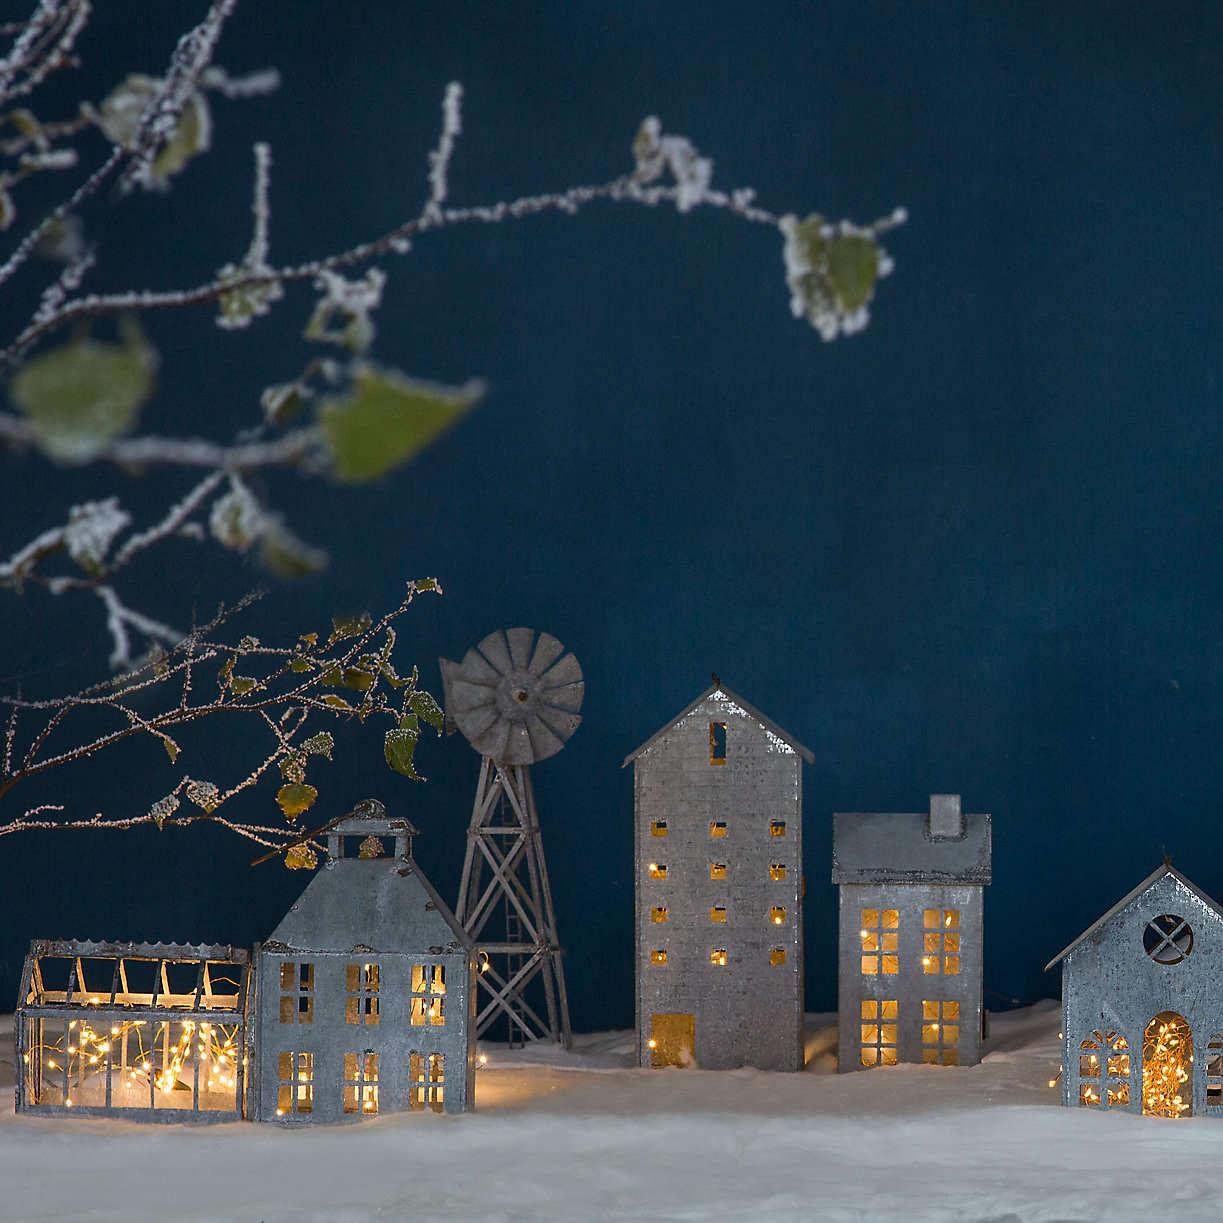 terrain-christmas-village-zinc-town-country-lanterns